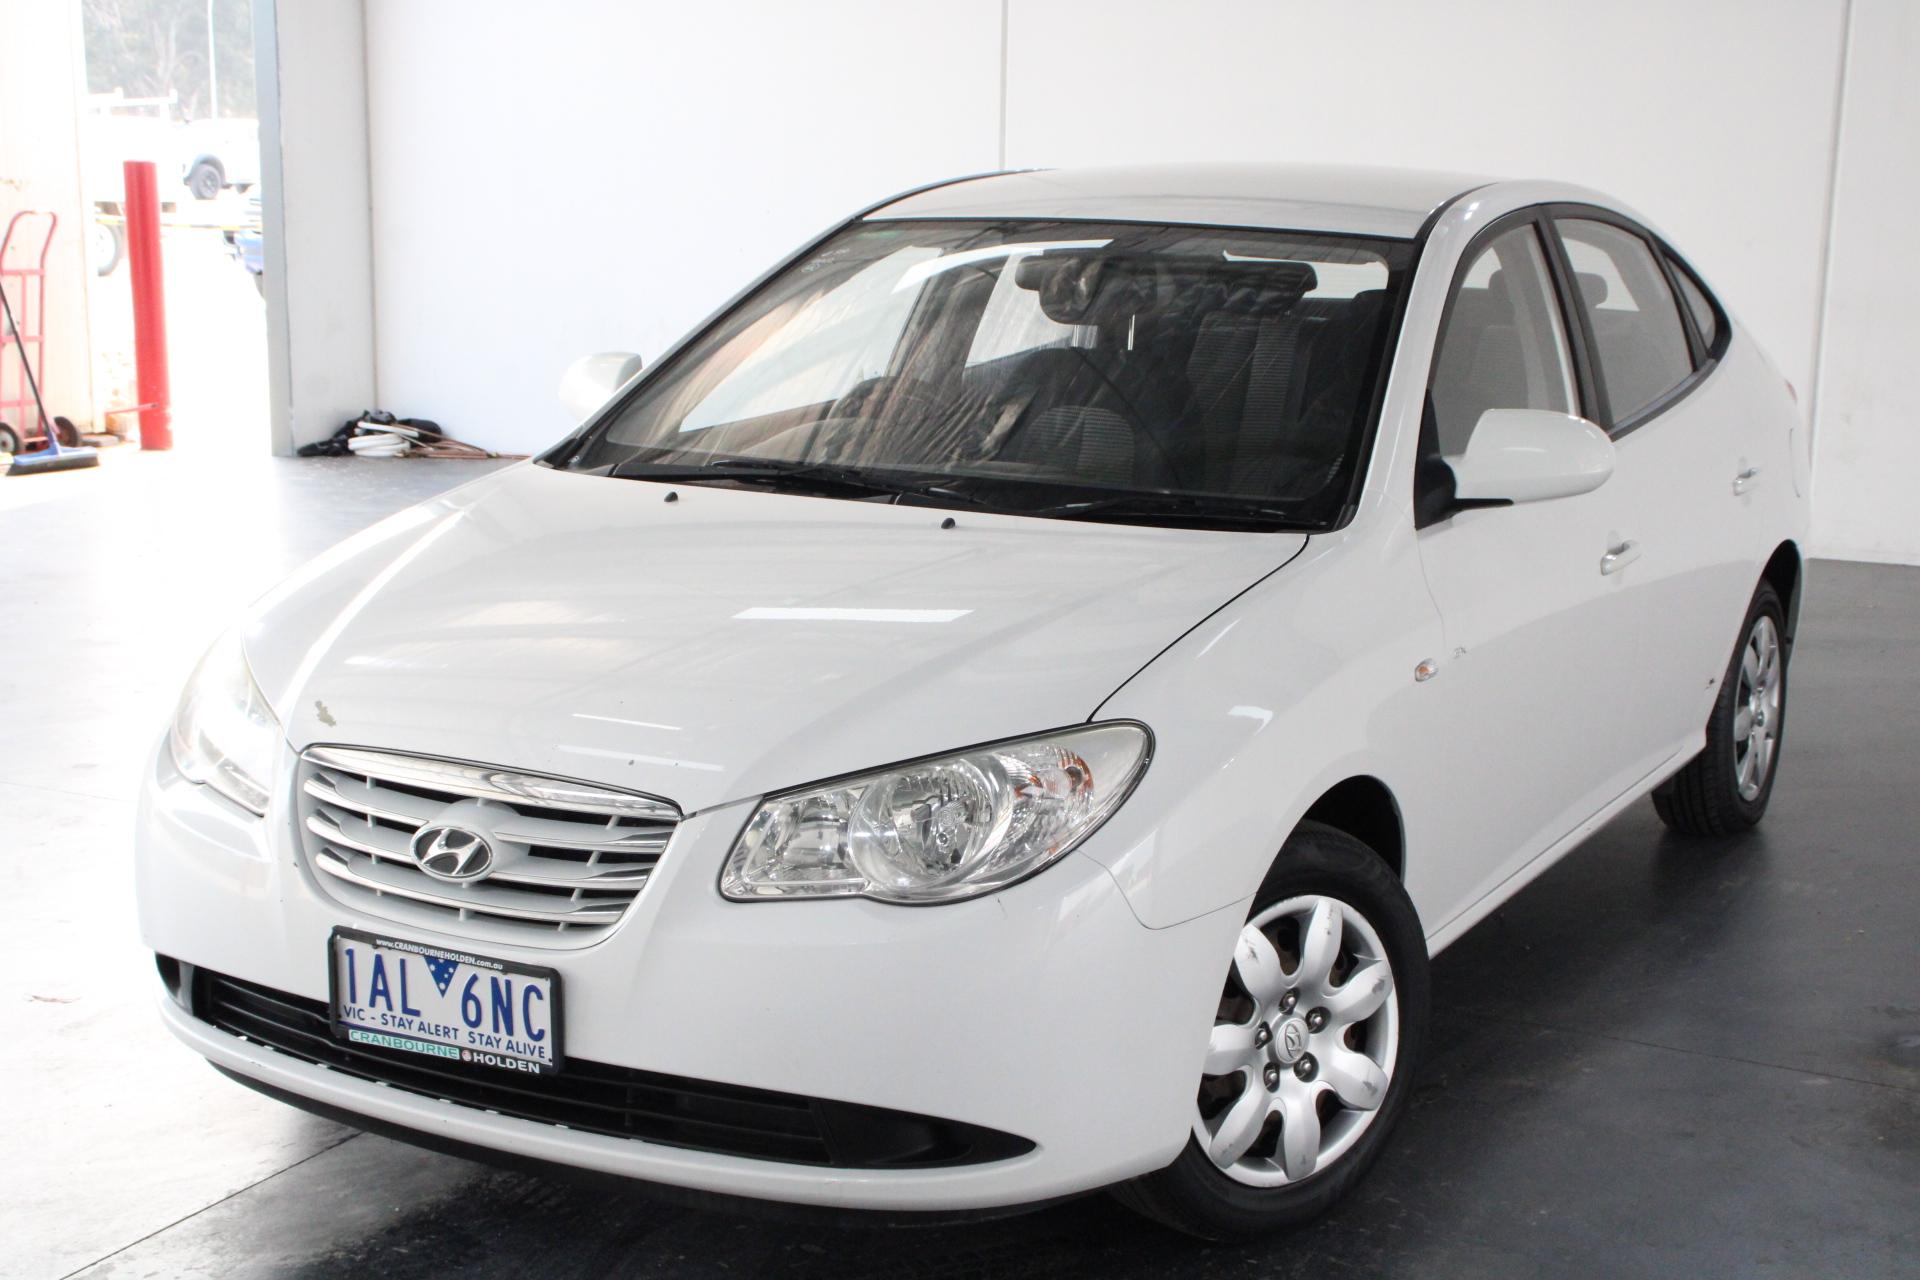 2010 Hyundai Elantra SX HD Automatic Sedan